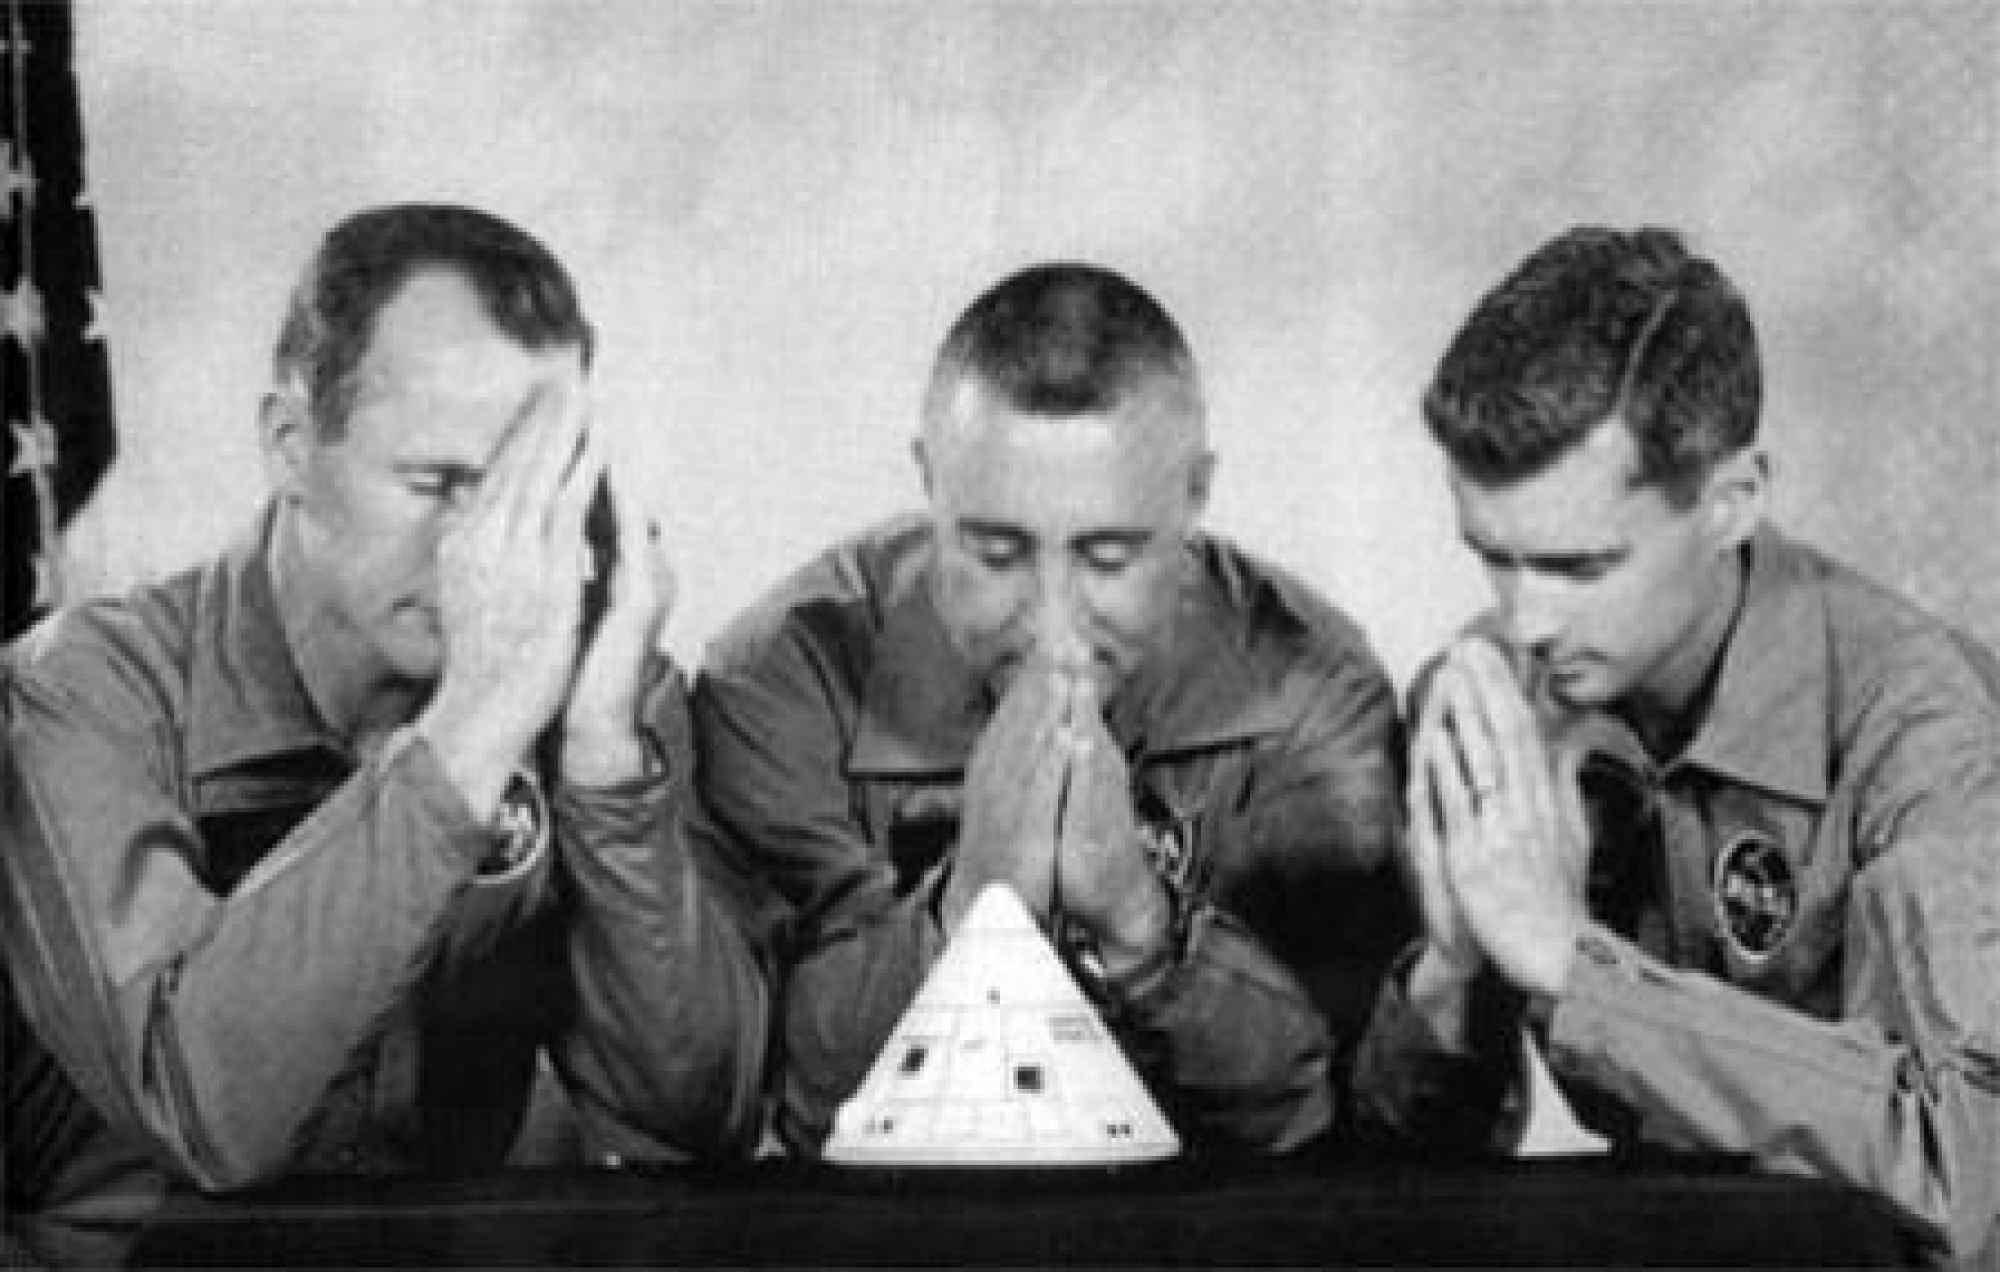 The Tragedy of Apollo 1 Reshaped the Future of NASA